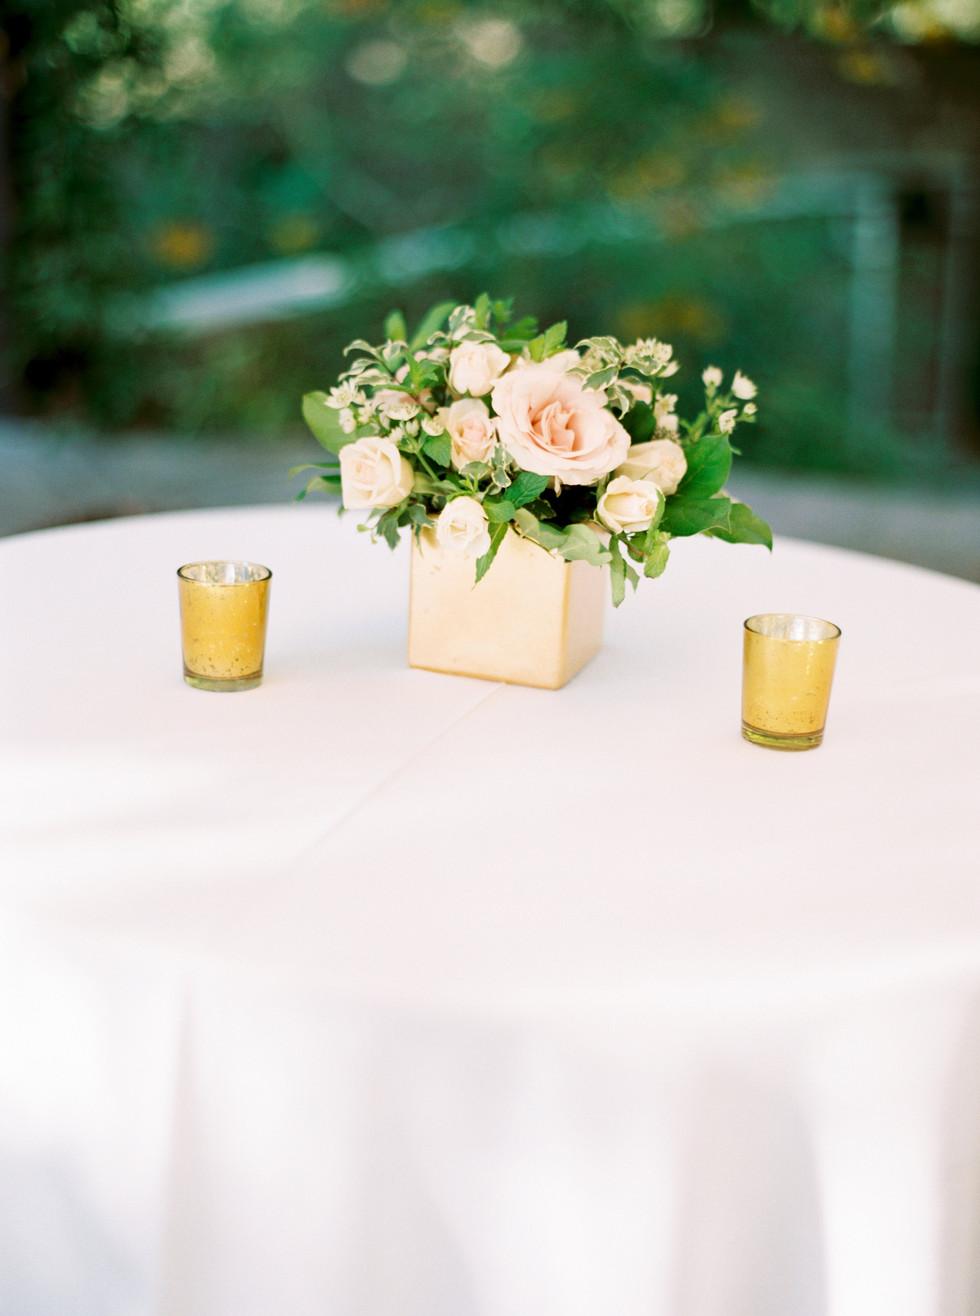 Blush and ivory floral arrangement for cocktail table. Photo: Shannon Elizabeth